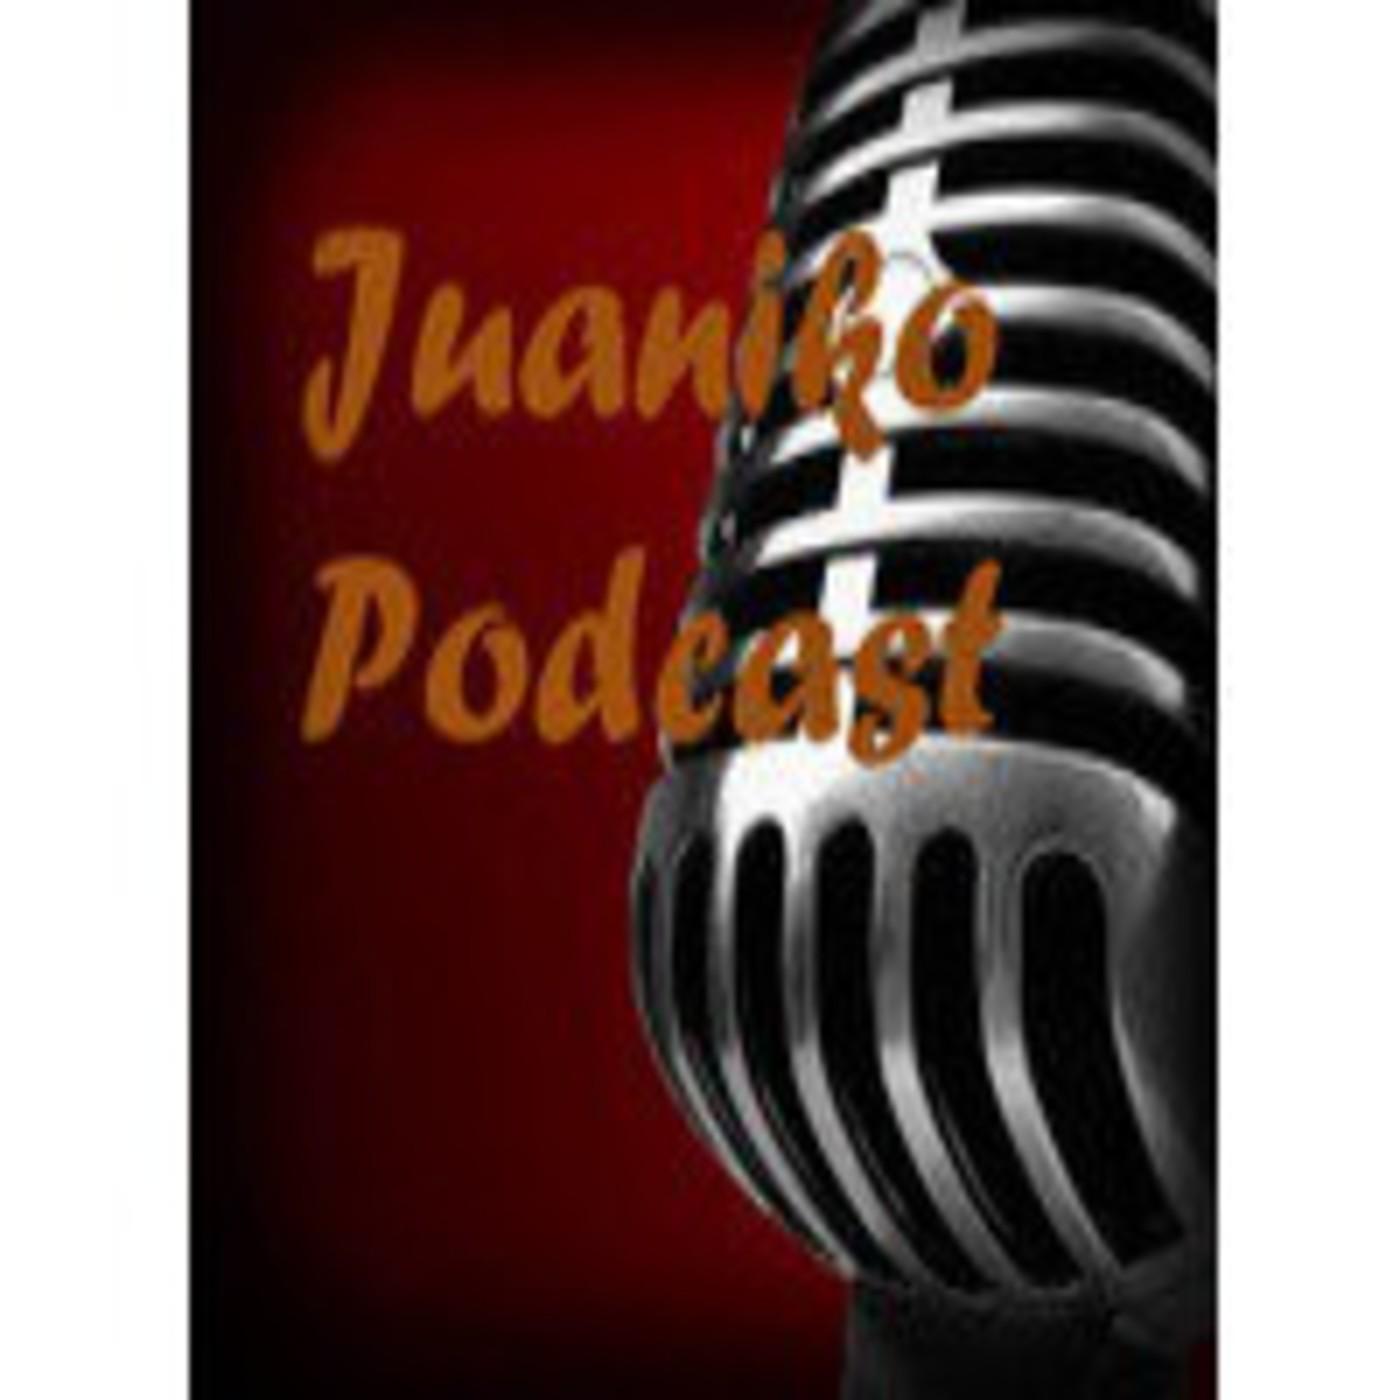 <![CDATA[Podcast de Juaniko]]>